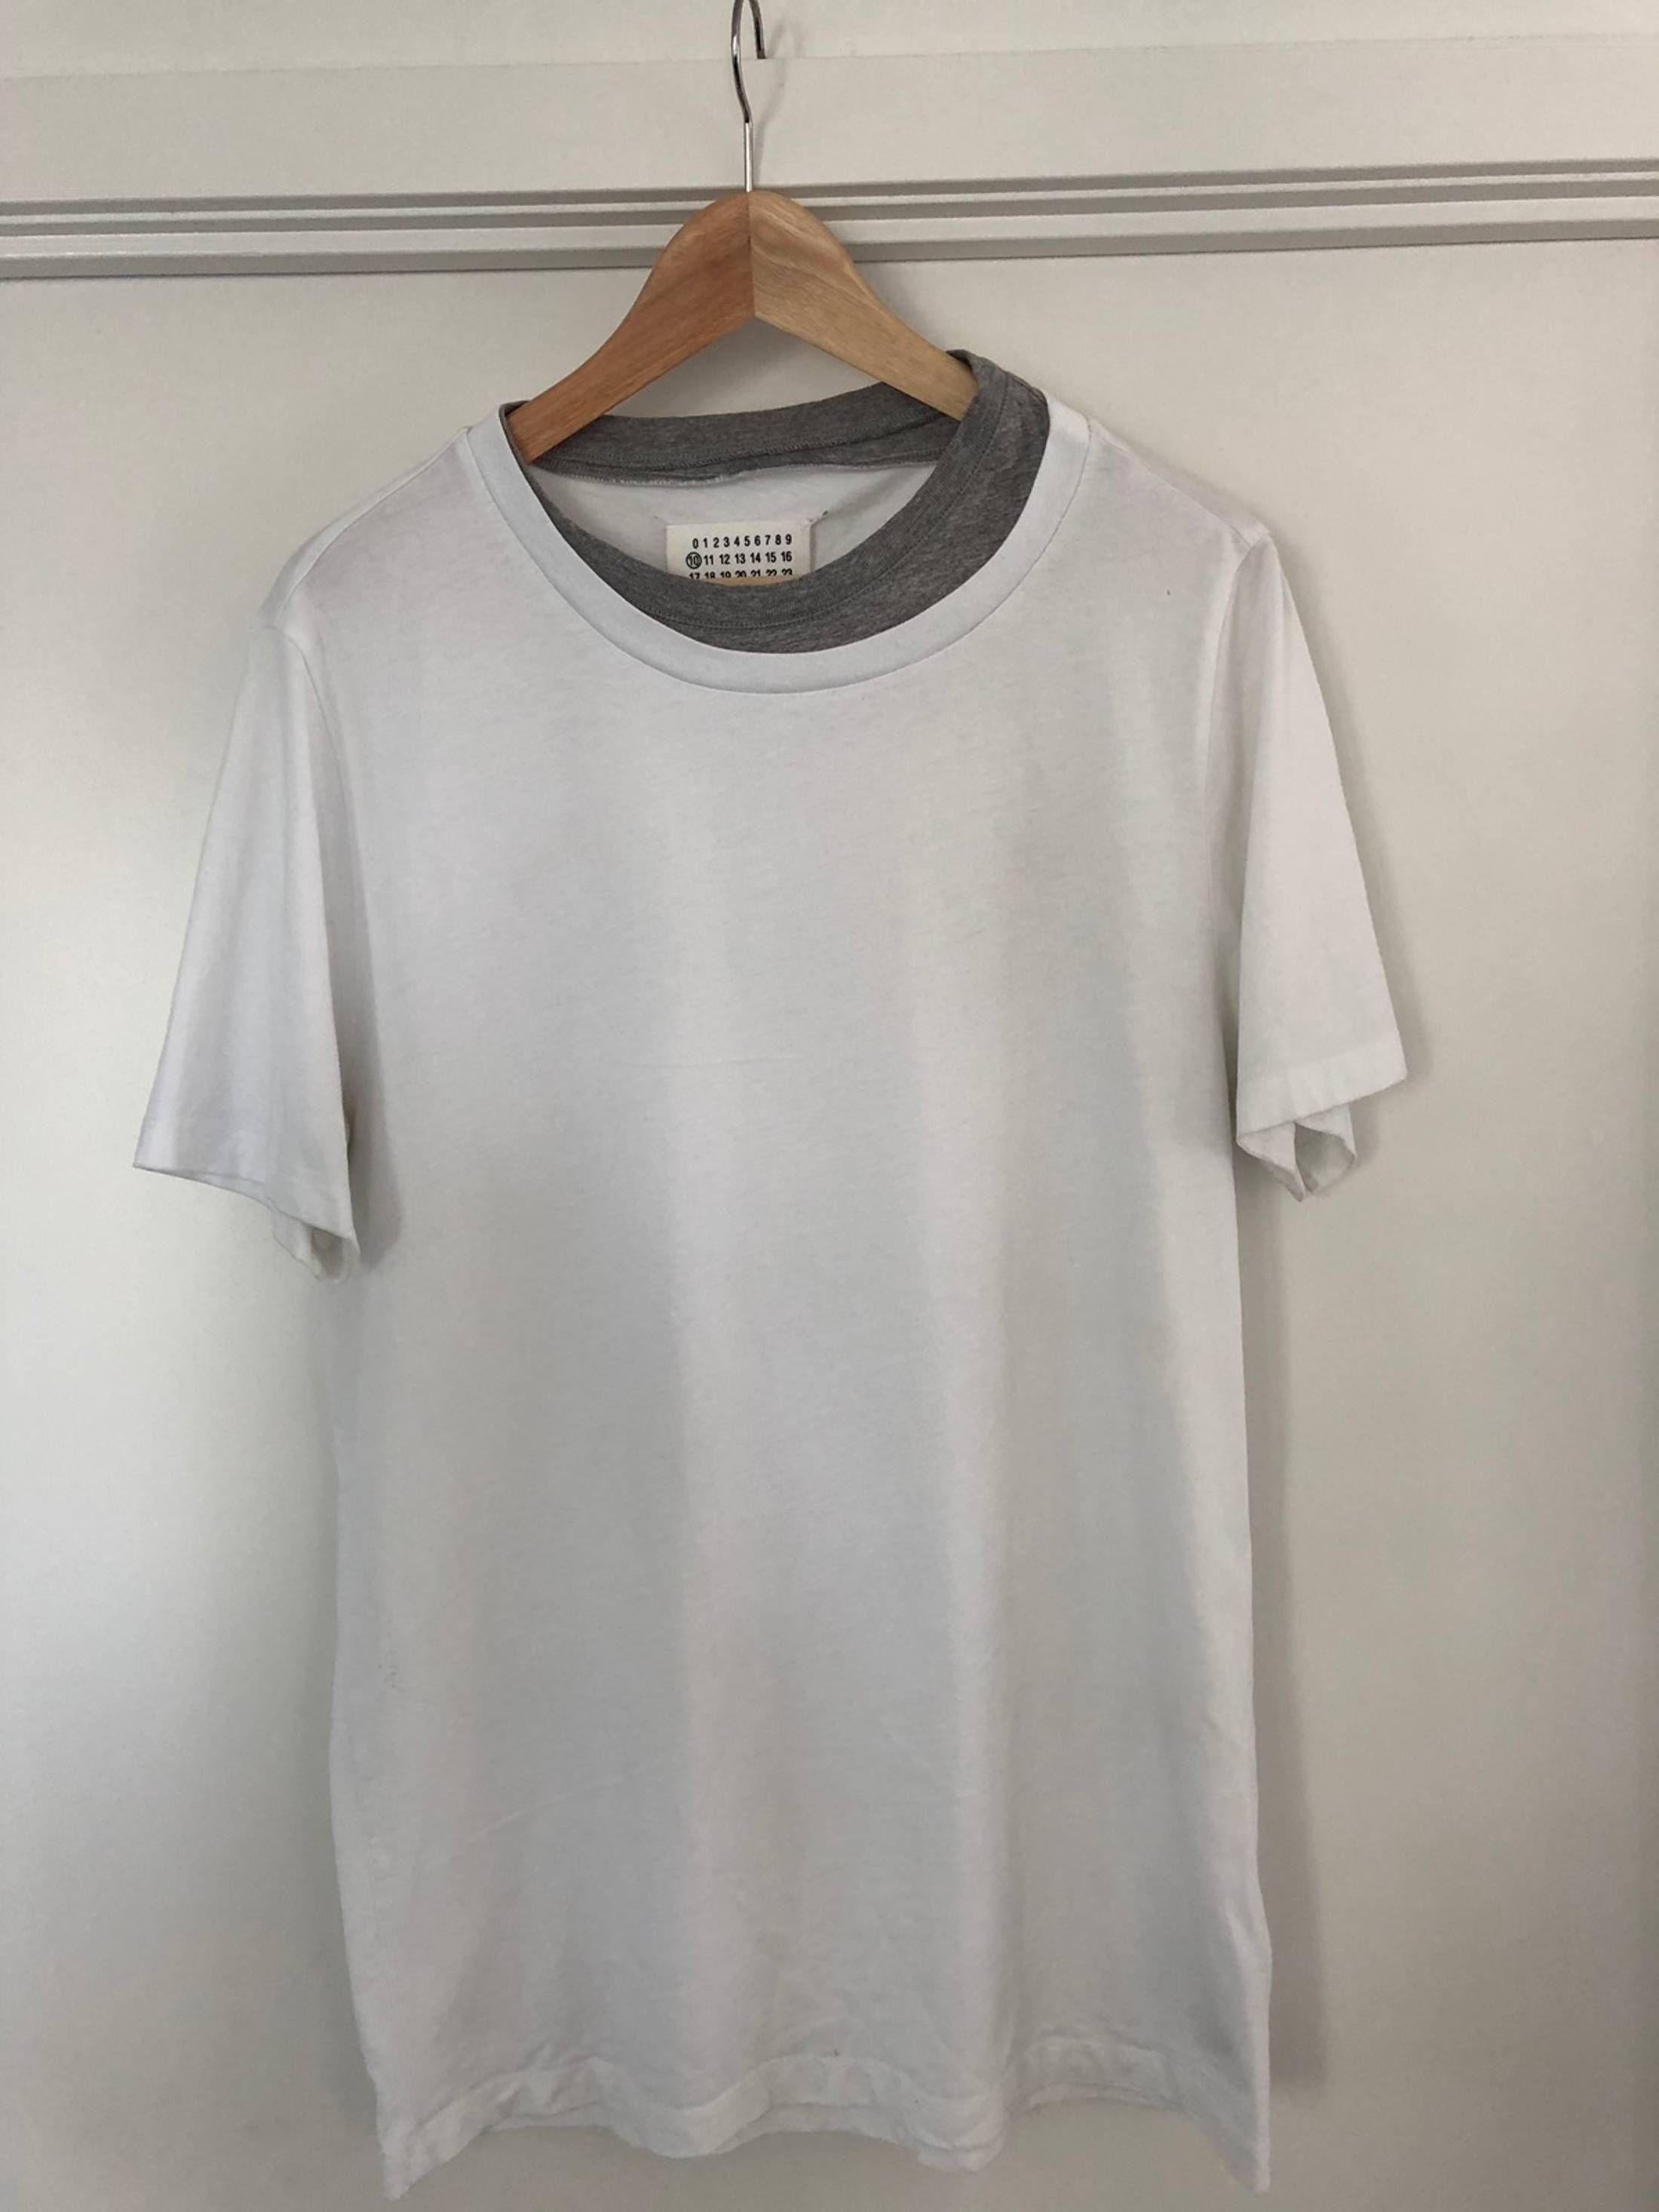 Maison Margiela Maison Margiela Double Collar T Shirt Size M